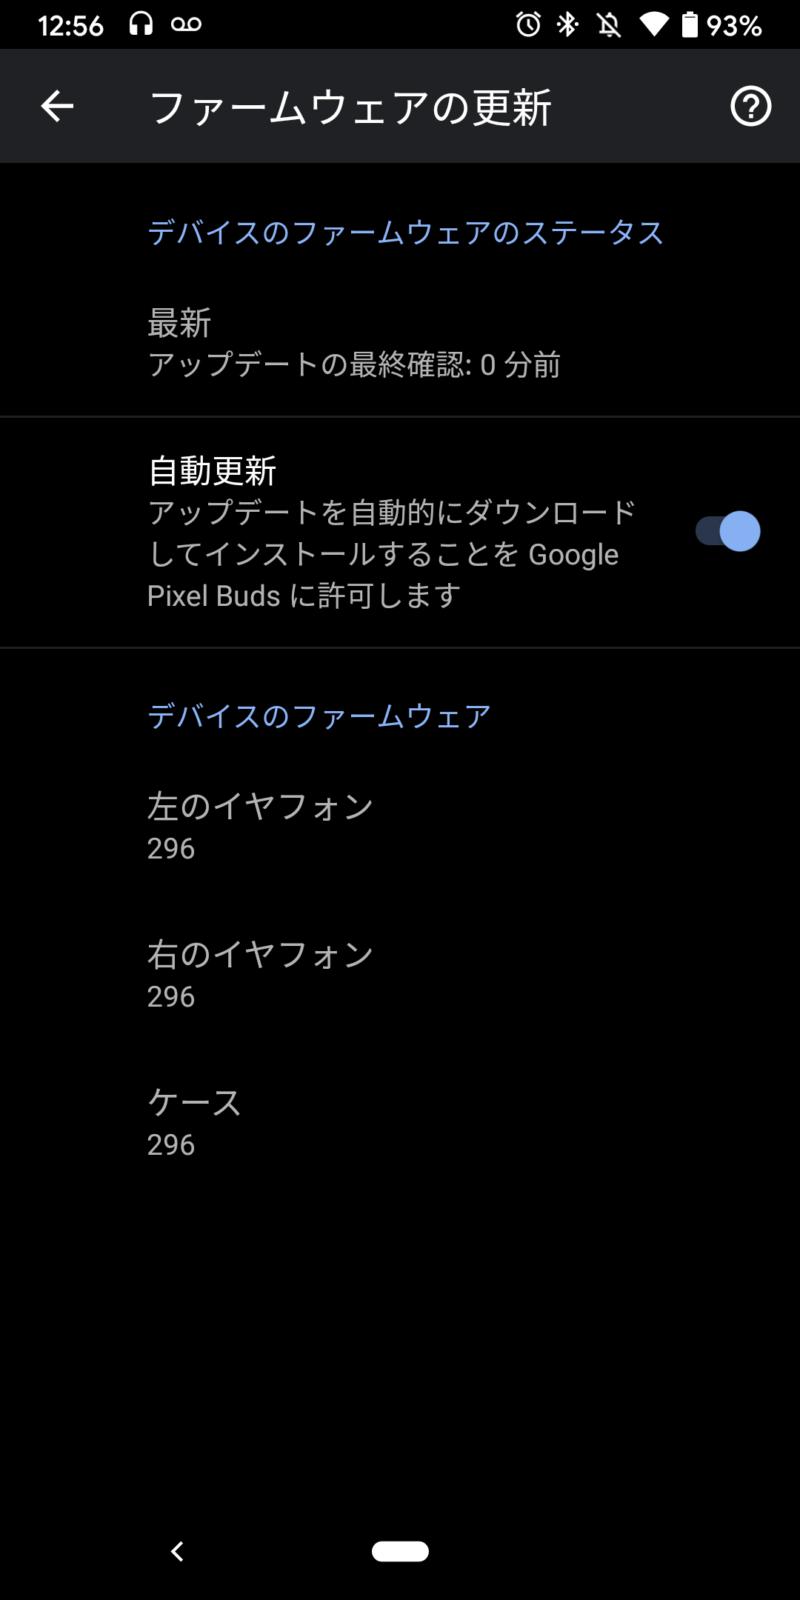 Screenshot 20200611 125659 800x1600-Google Pixel Budsのヒスノイズ問題がファームウェア 296で修正